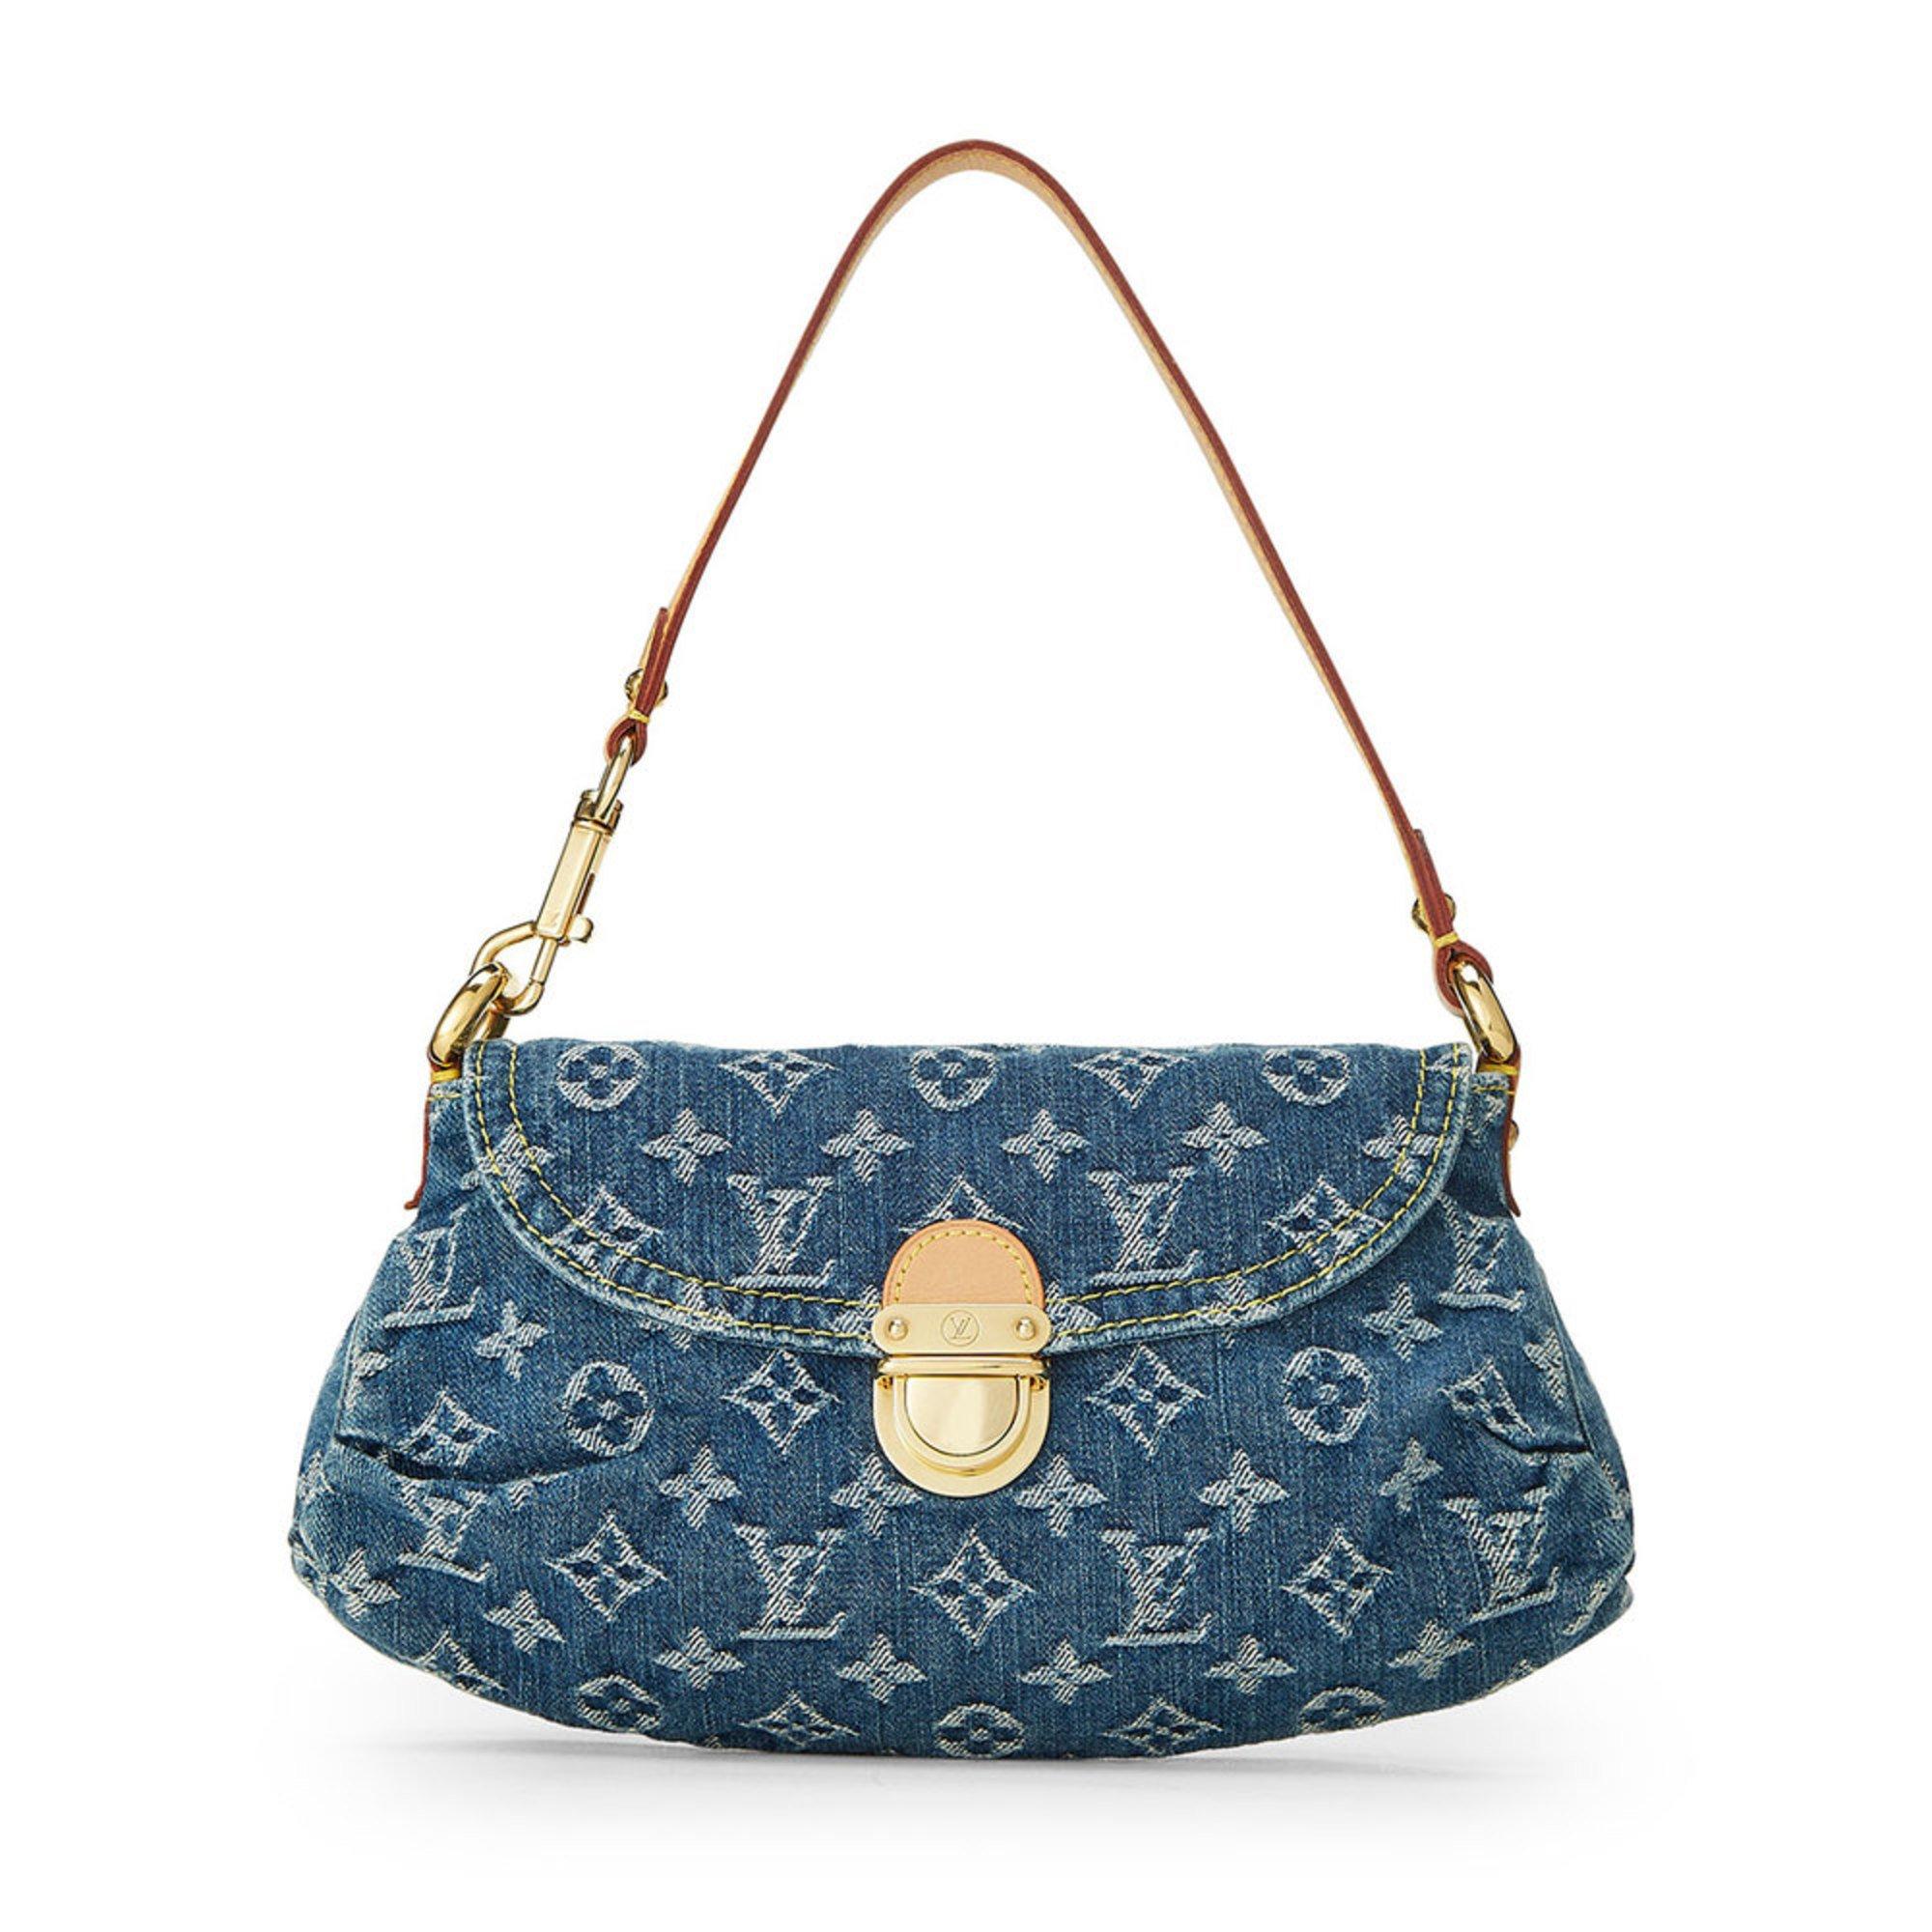 e0e0ae7af37 Louis Vuitton Blue Denim Pleaty Mini